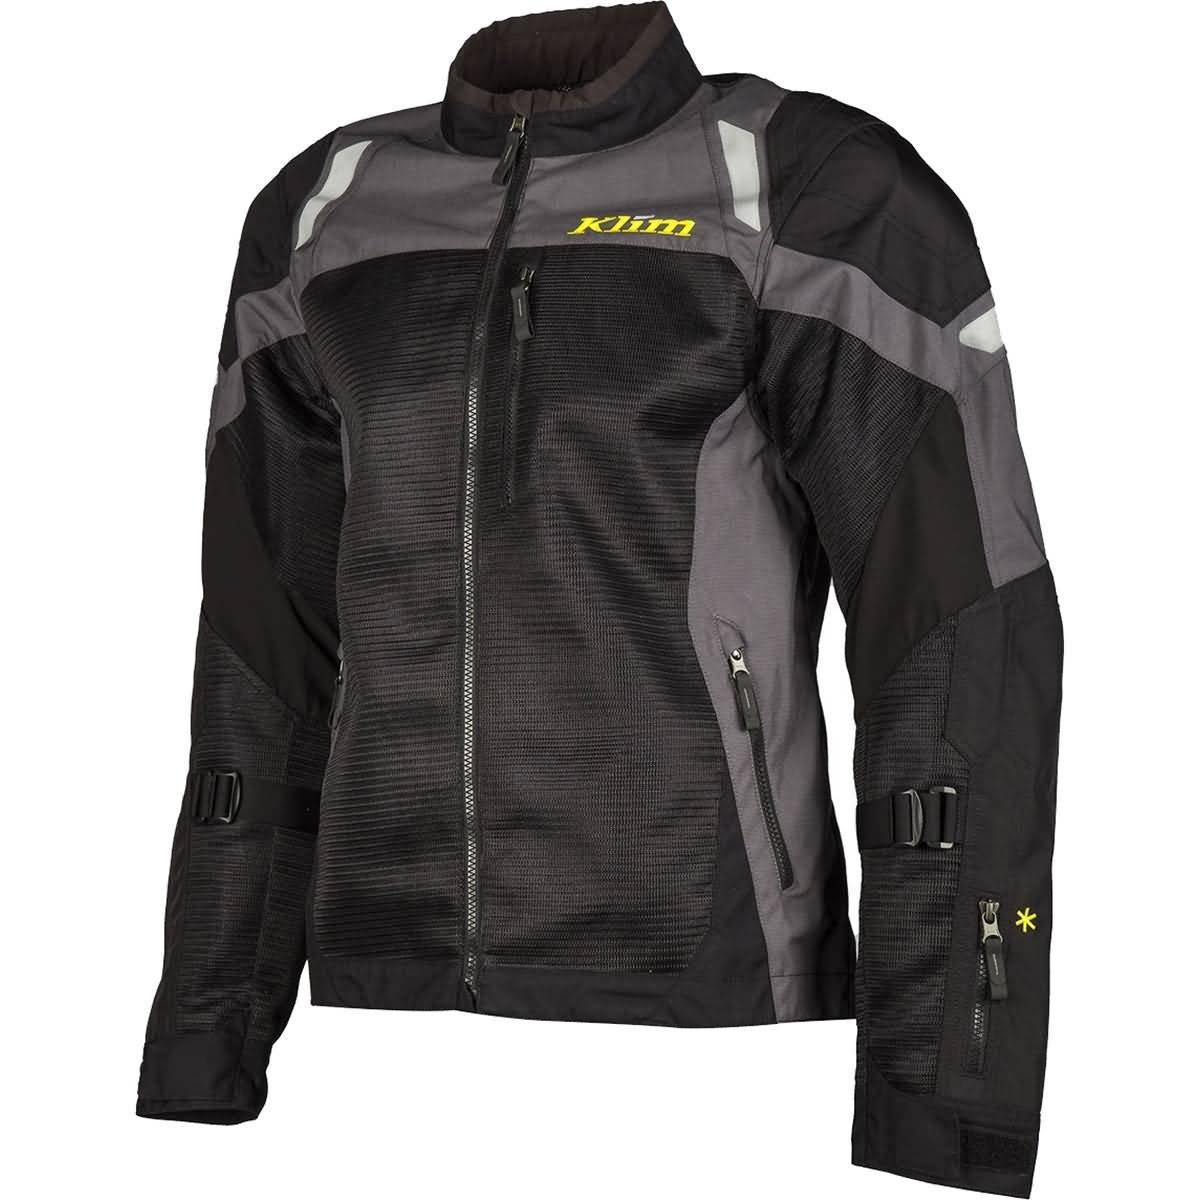 Klim Induction Men's Street Motorcycle Jackets - Dark Gray/Large